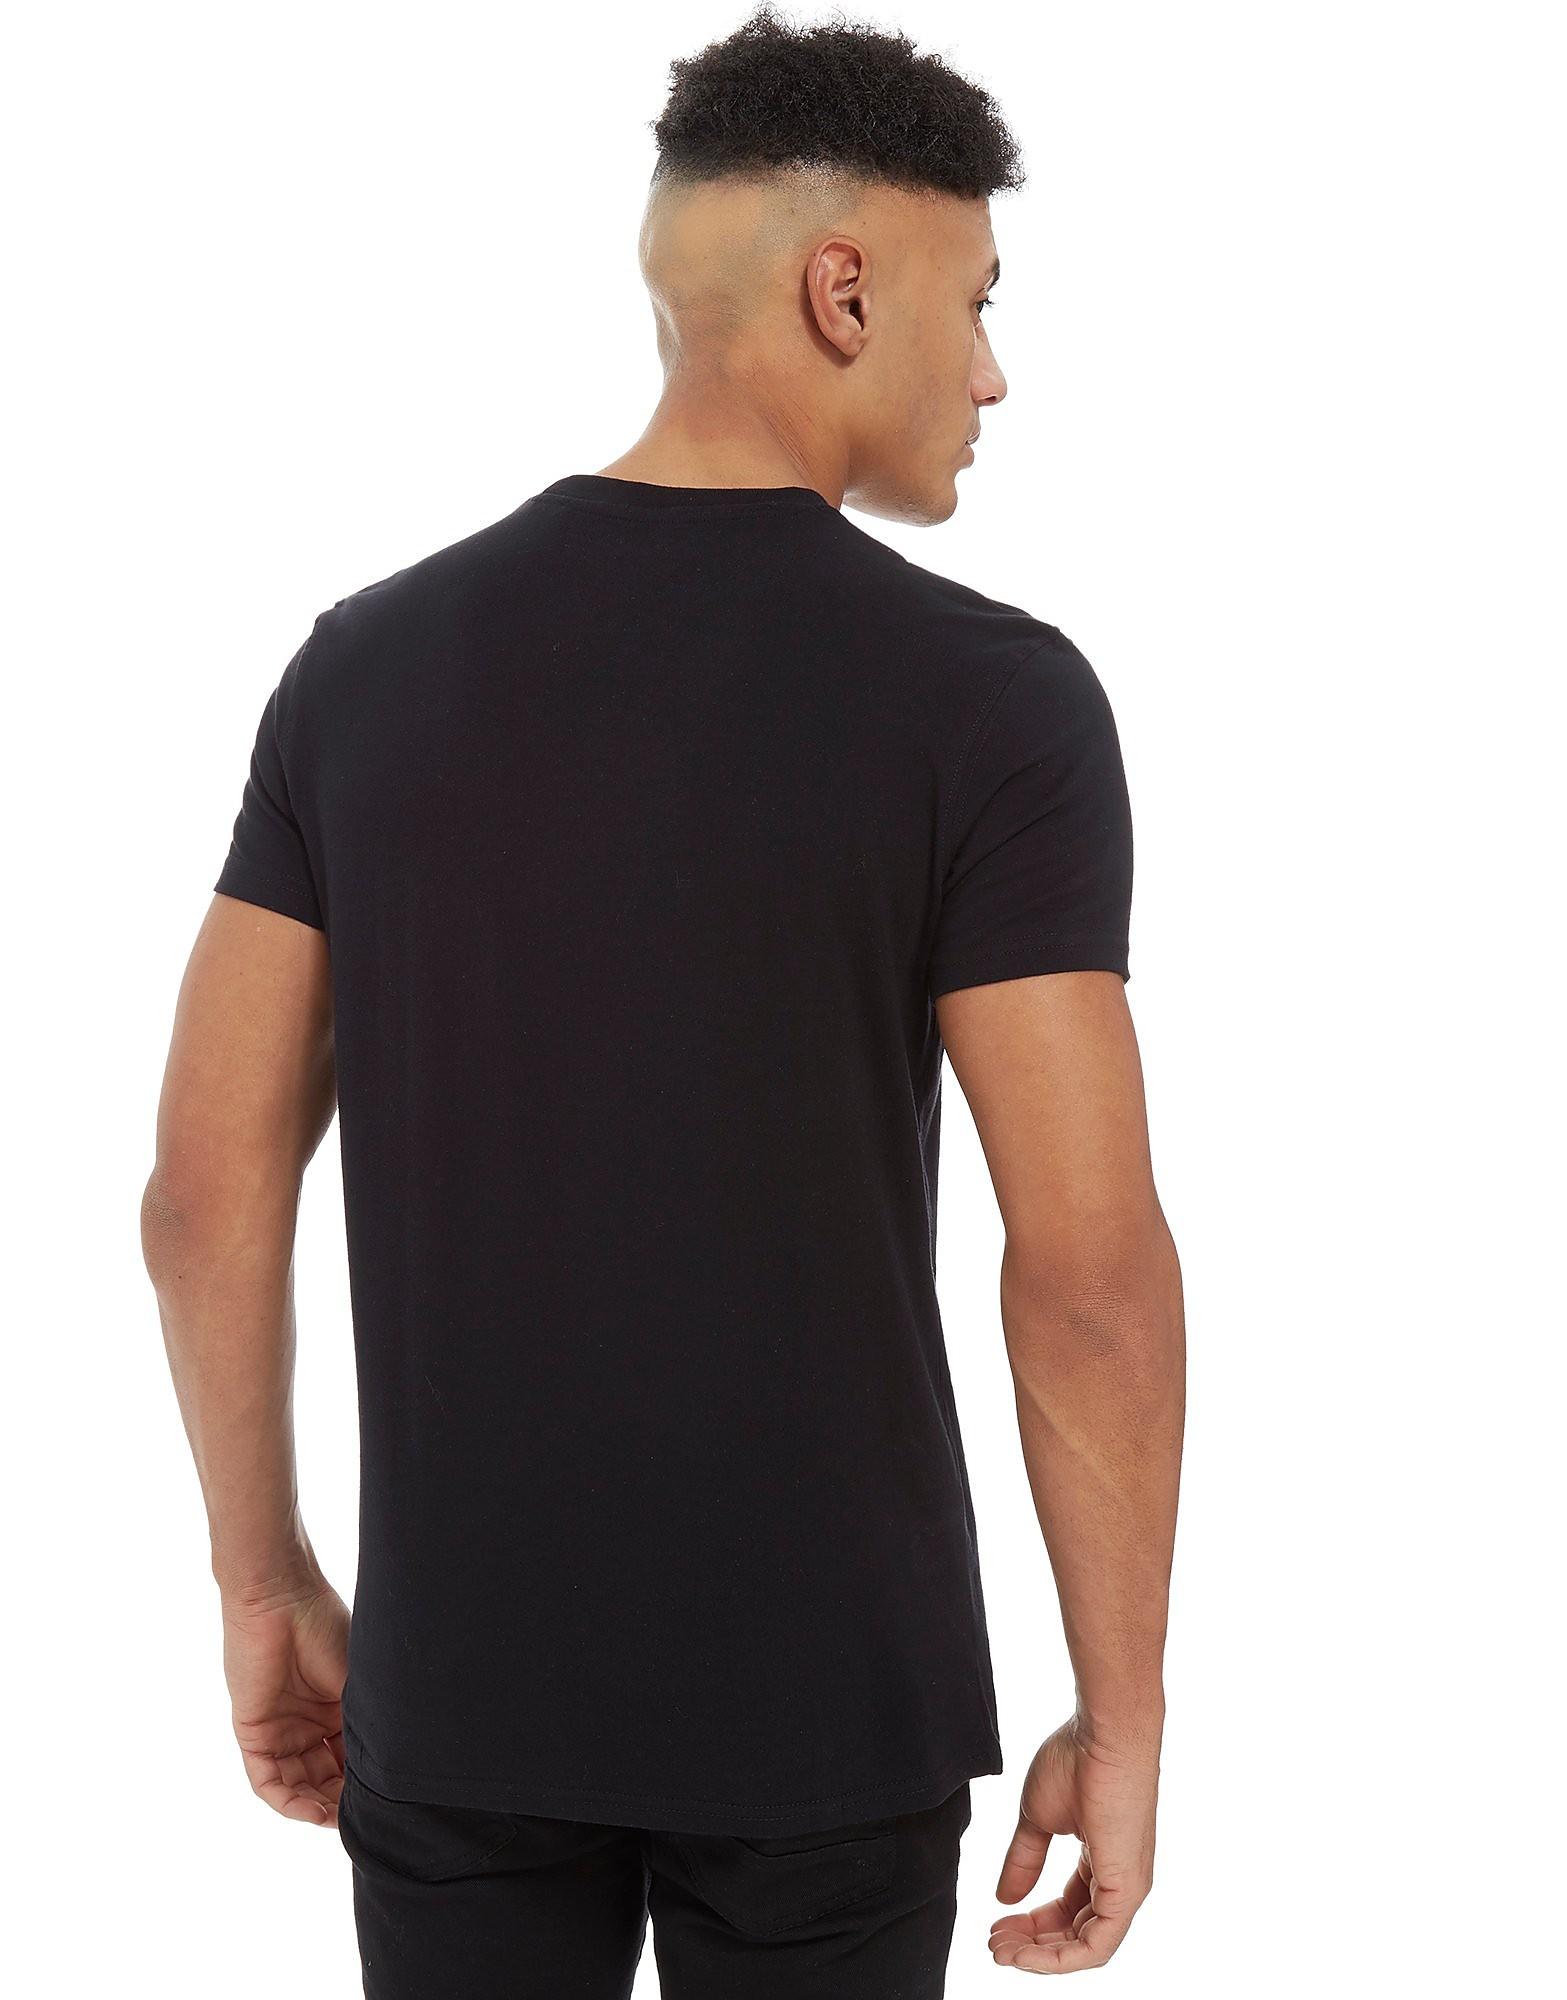 McKenzie Chase T-Shirt